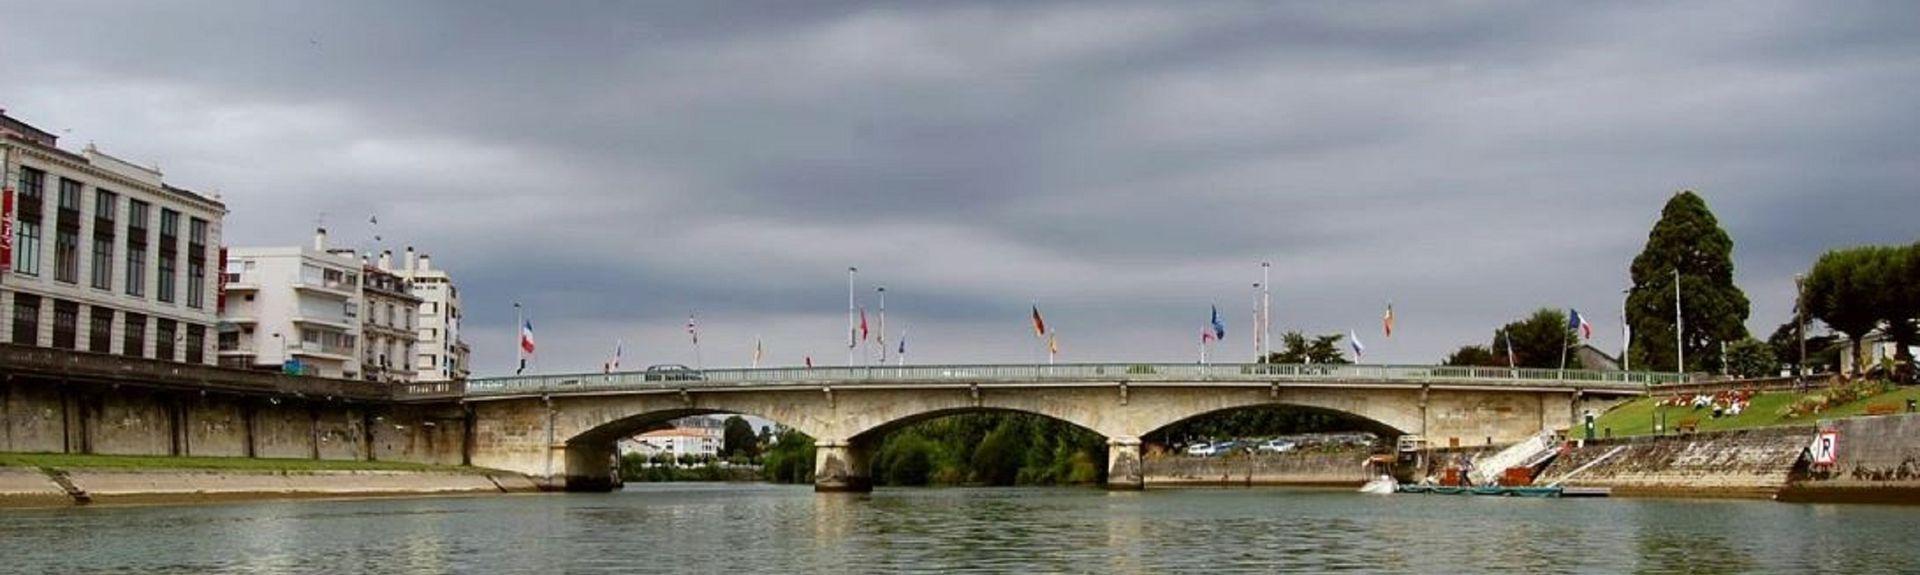 Saint-Romain-de-Benet, France